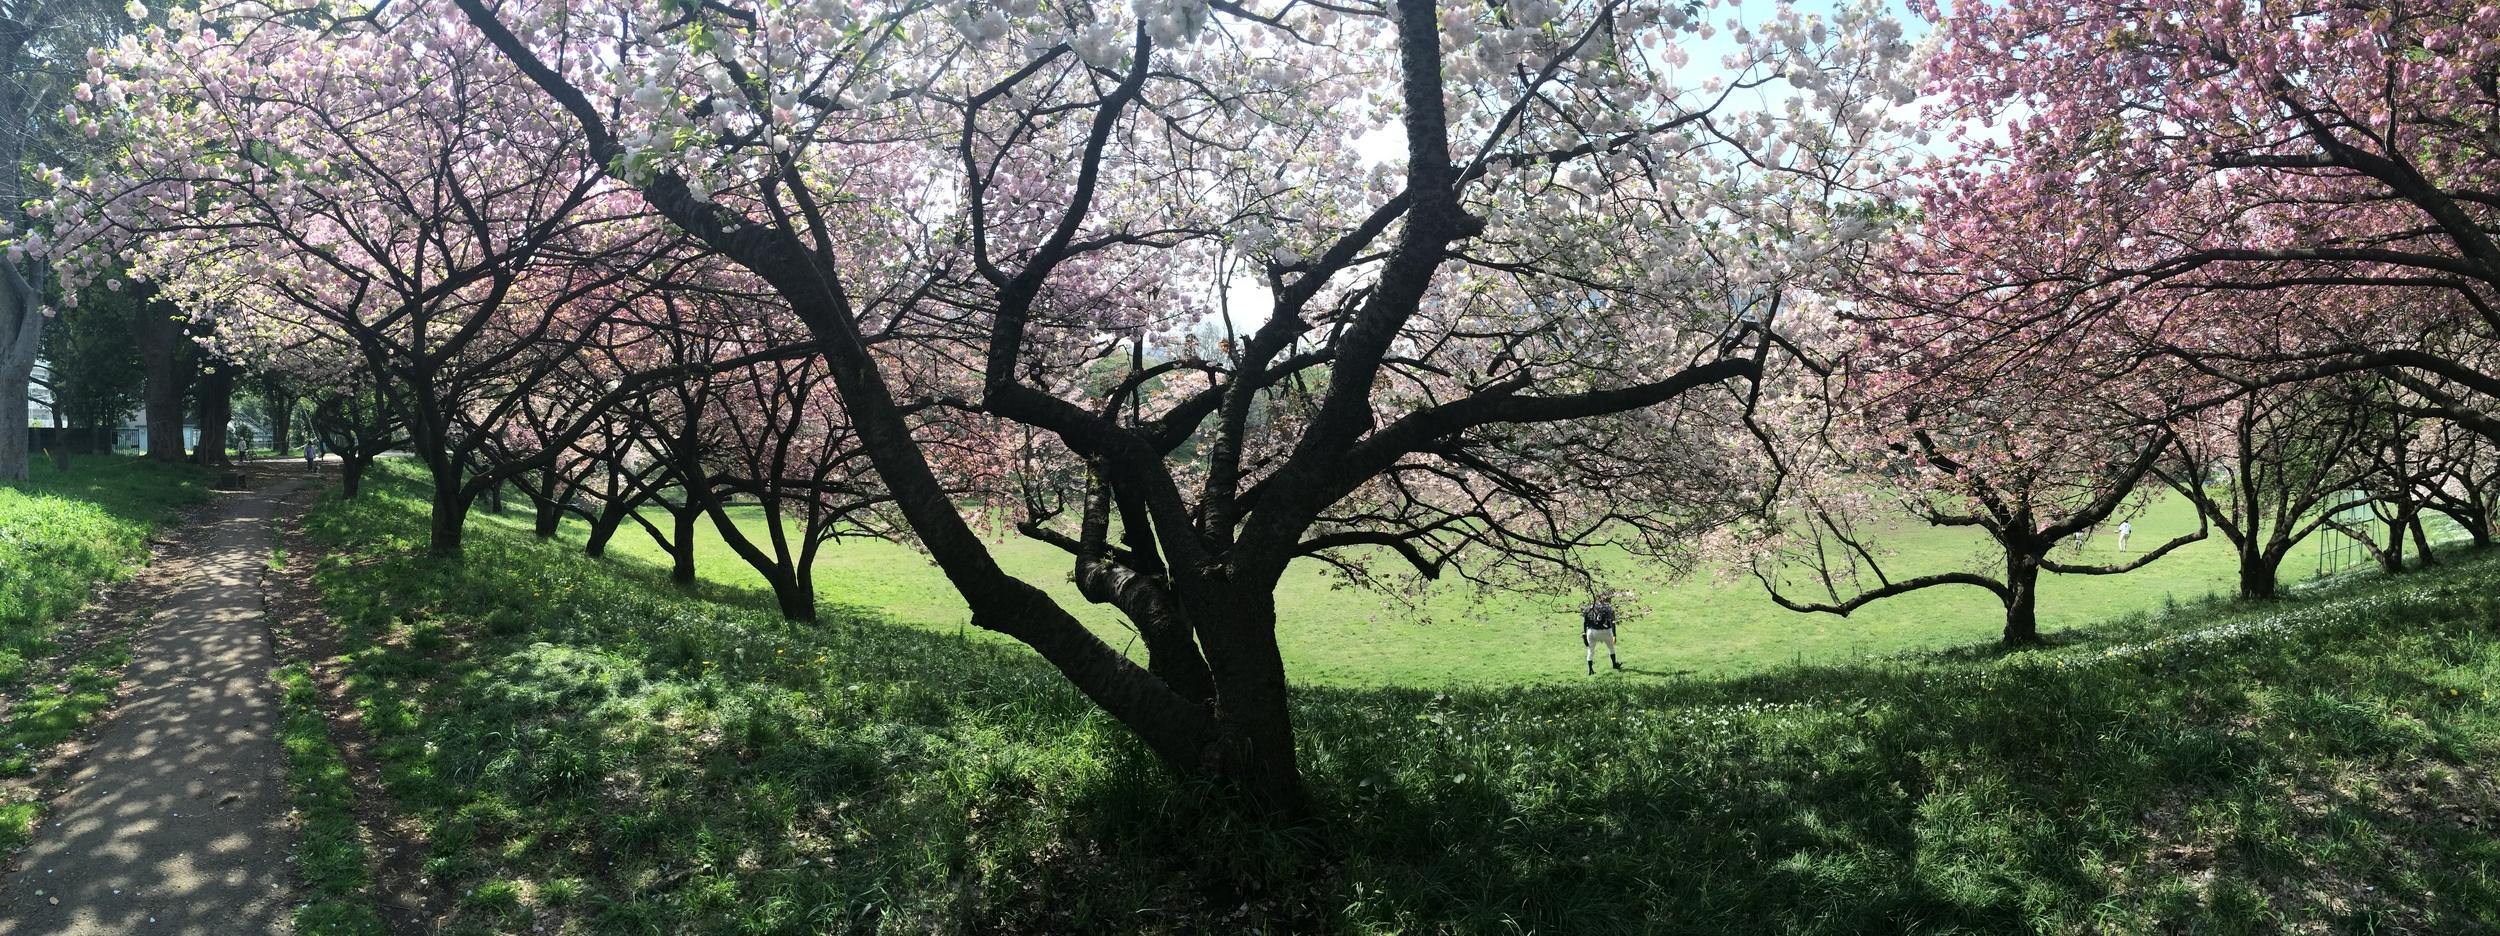 Cherry Blossom Season in Tokyo